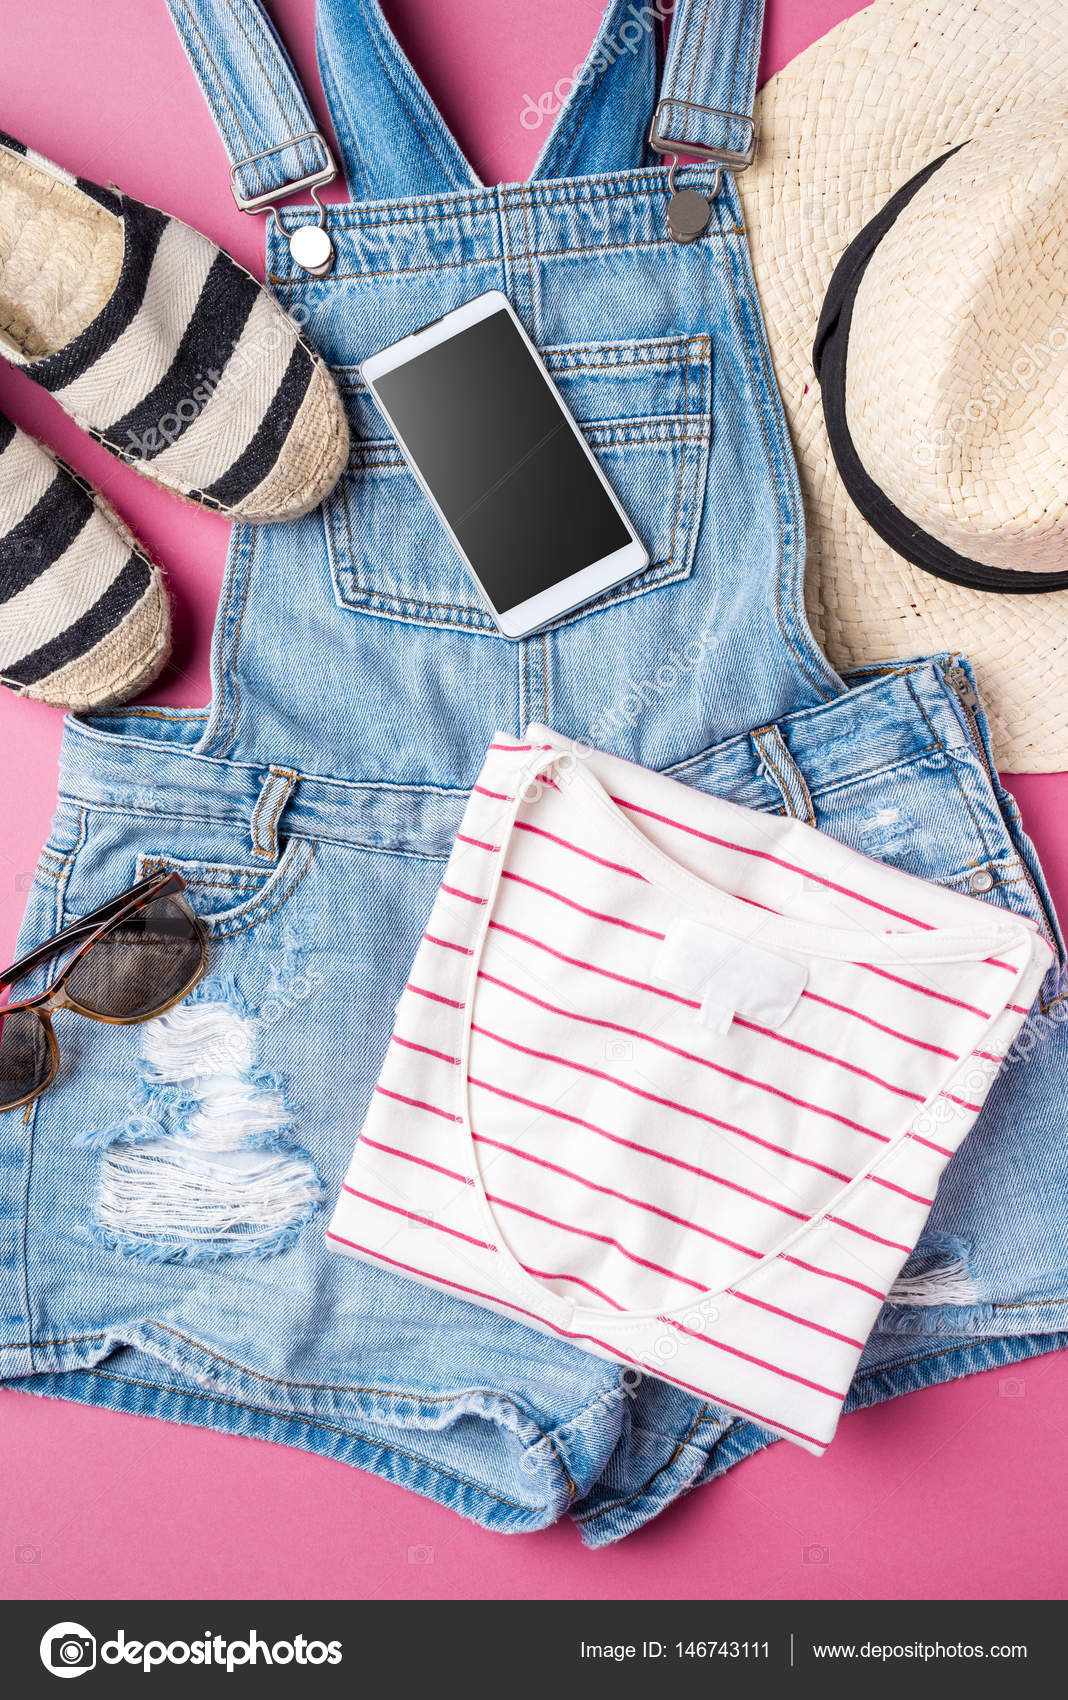 608ca01b9471 Casual Γυναικεία ρούχα. Καλοκαίρι μόδα φόντο — Φωτογραφία Αρχείου ...